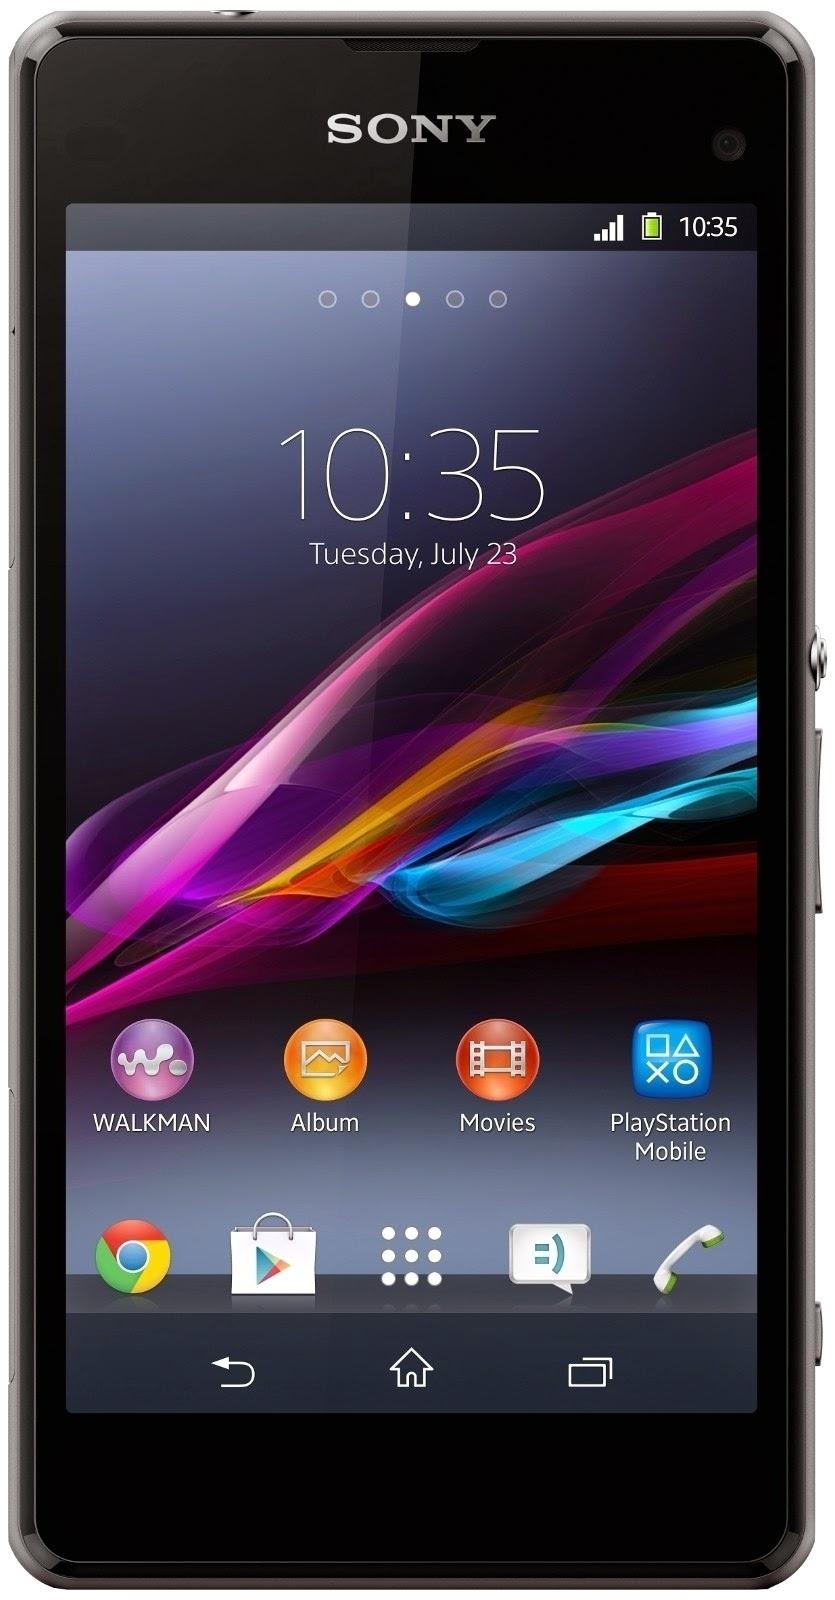 http://www.stradait.ro/telefoane/telefoane/smartphone/telefon-sony-xperia-z2-d6503-16gb-lte-4g-black-sn-600194.html